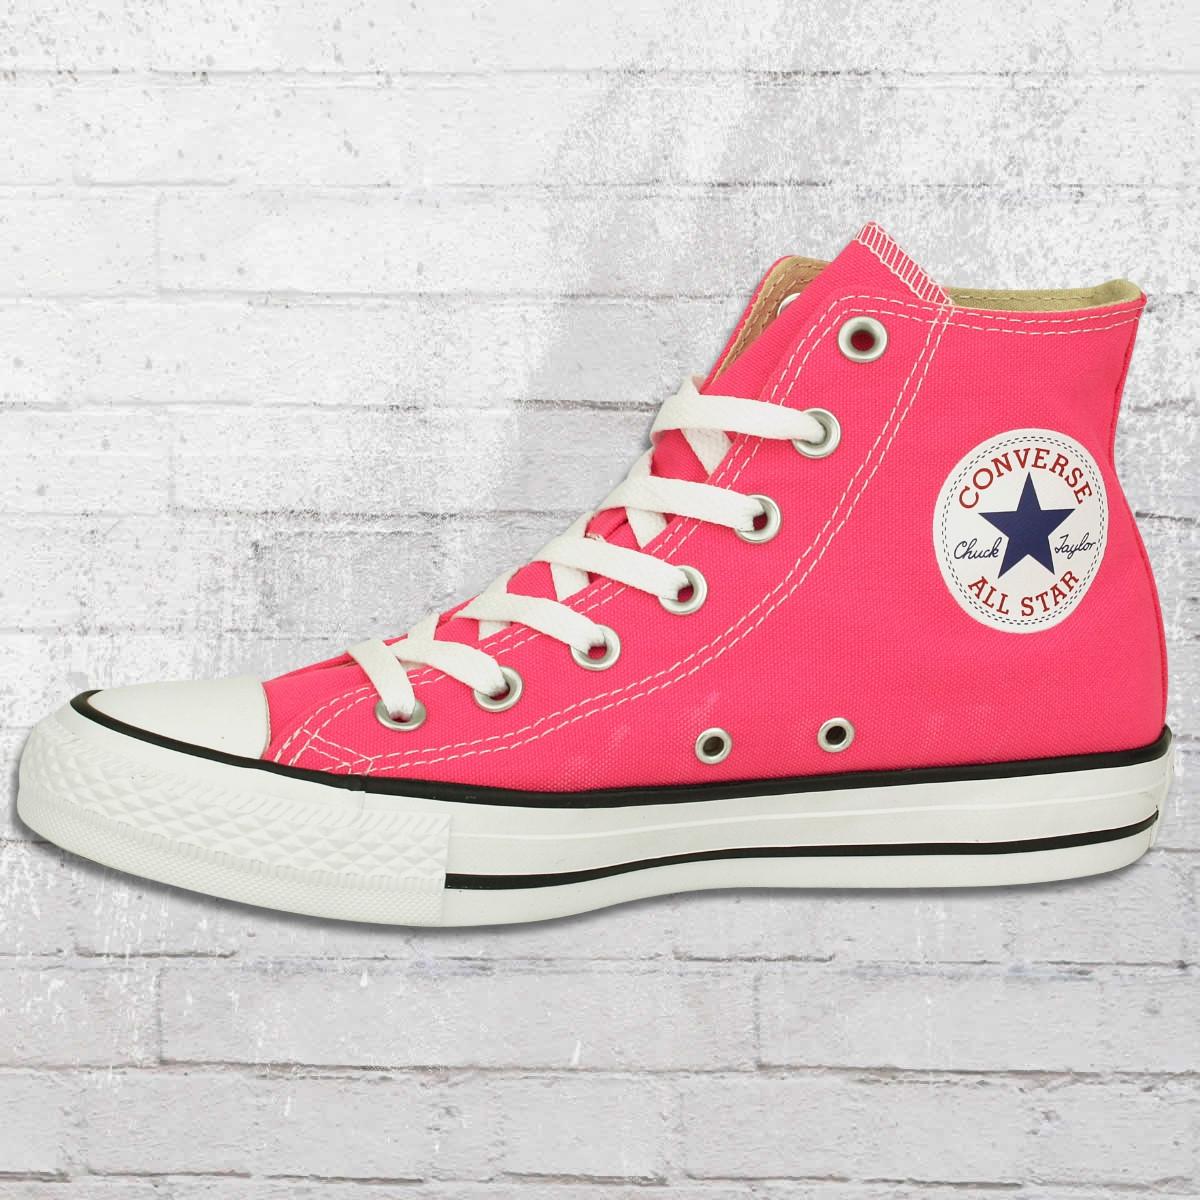 Converse Unisex Chucks CT High 157612 C Schuhe neon pink